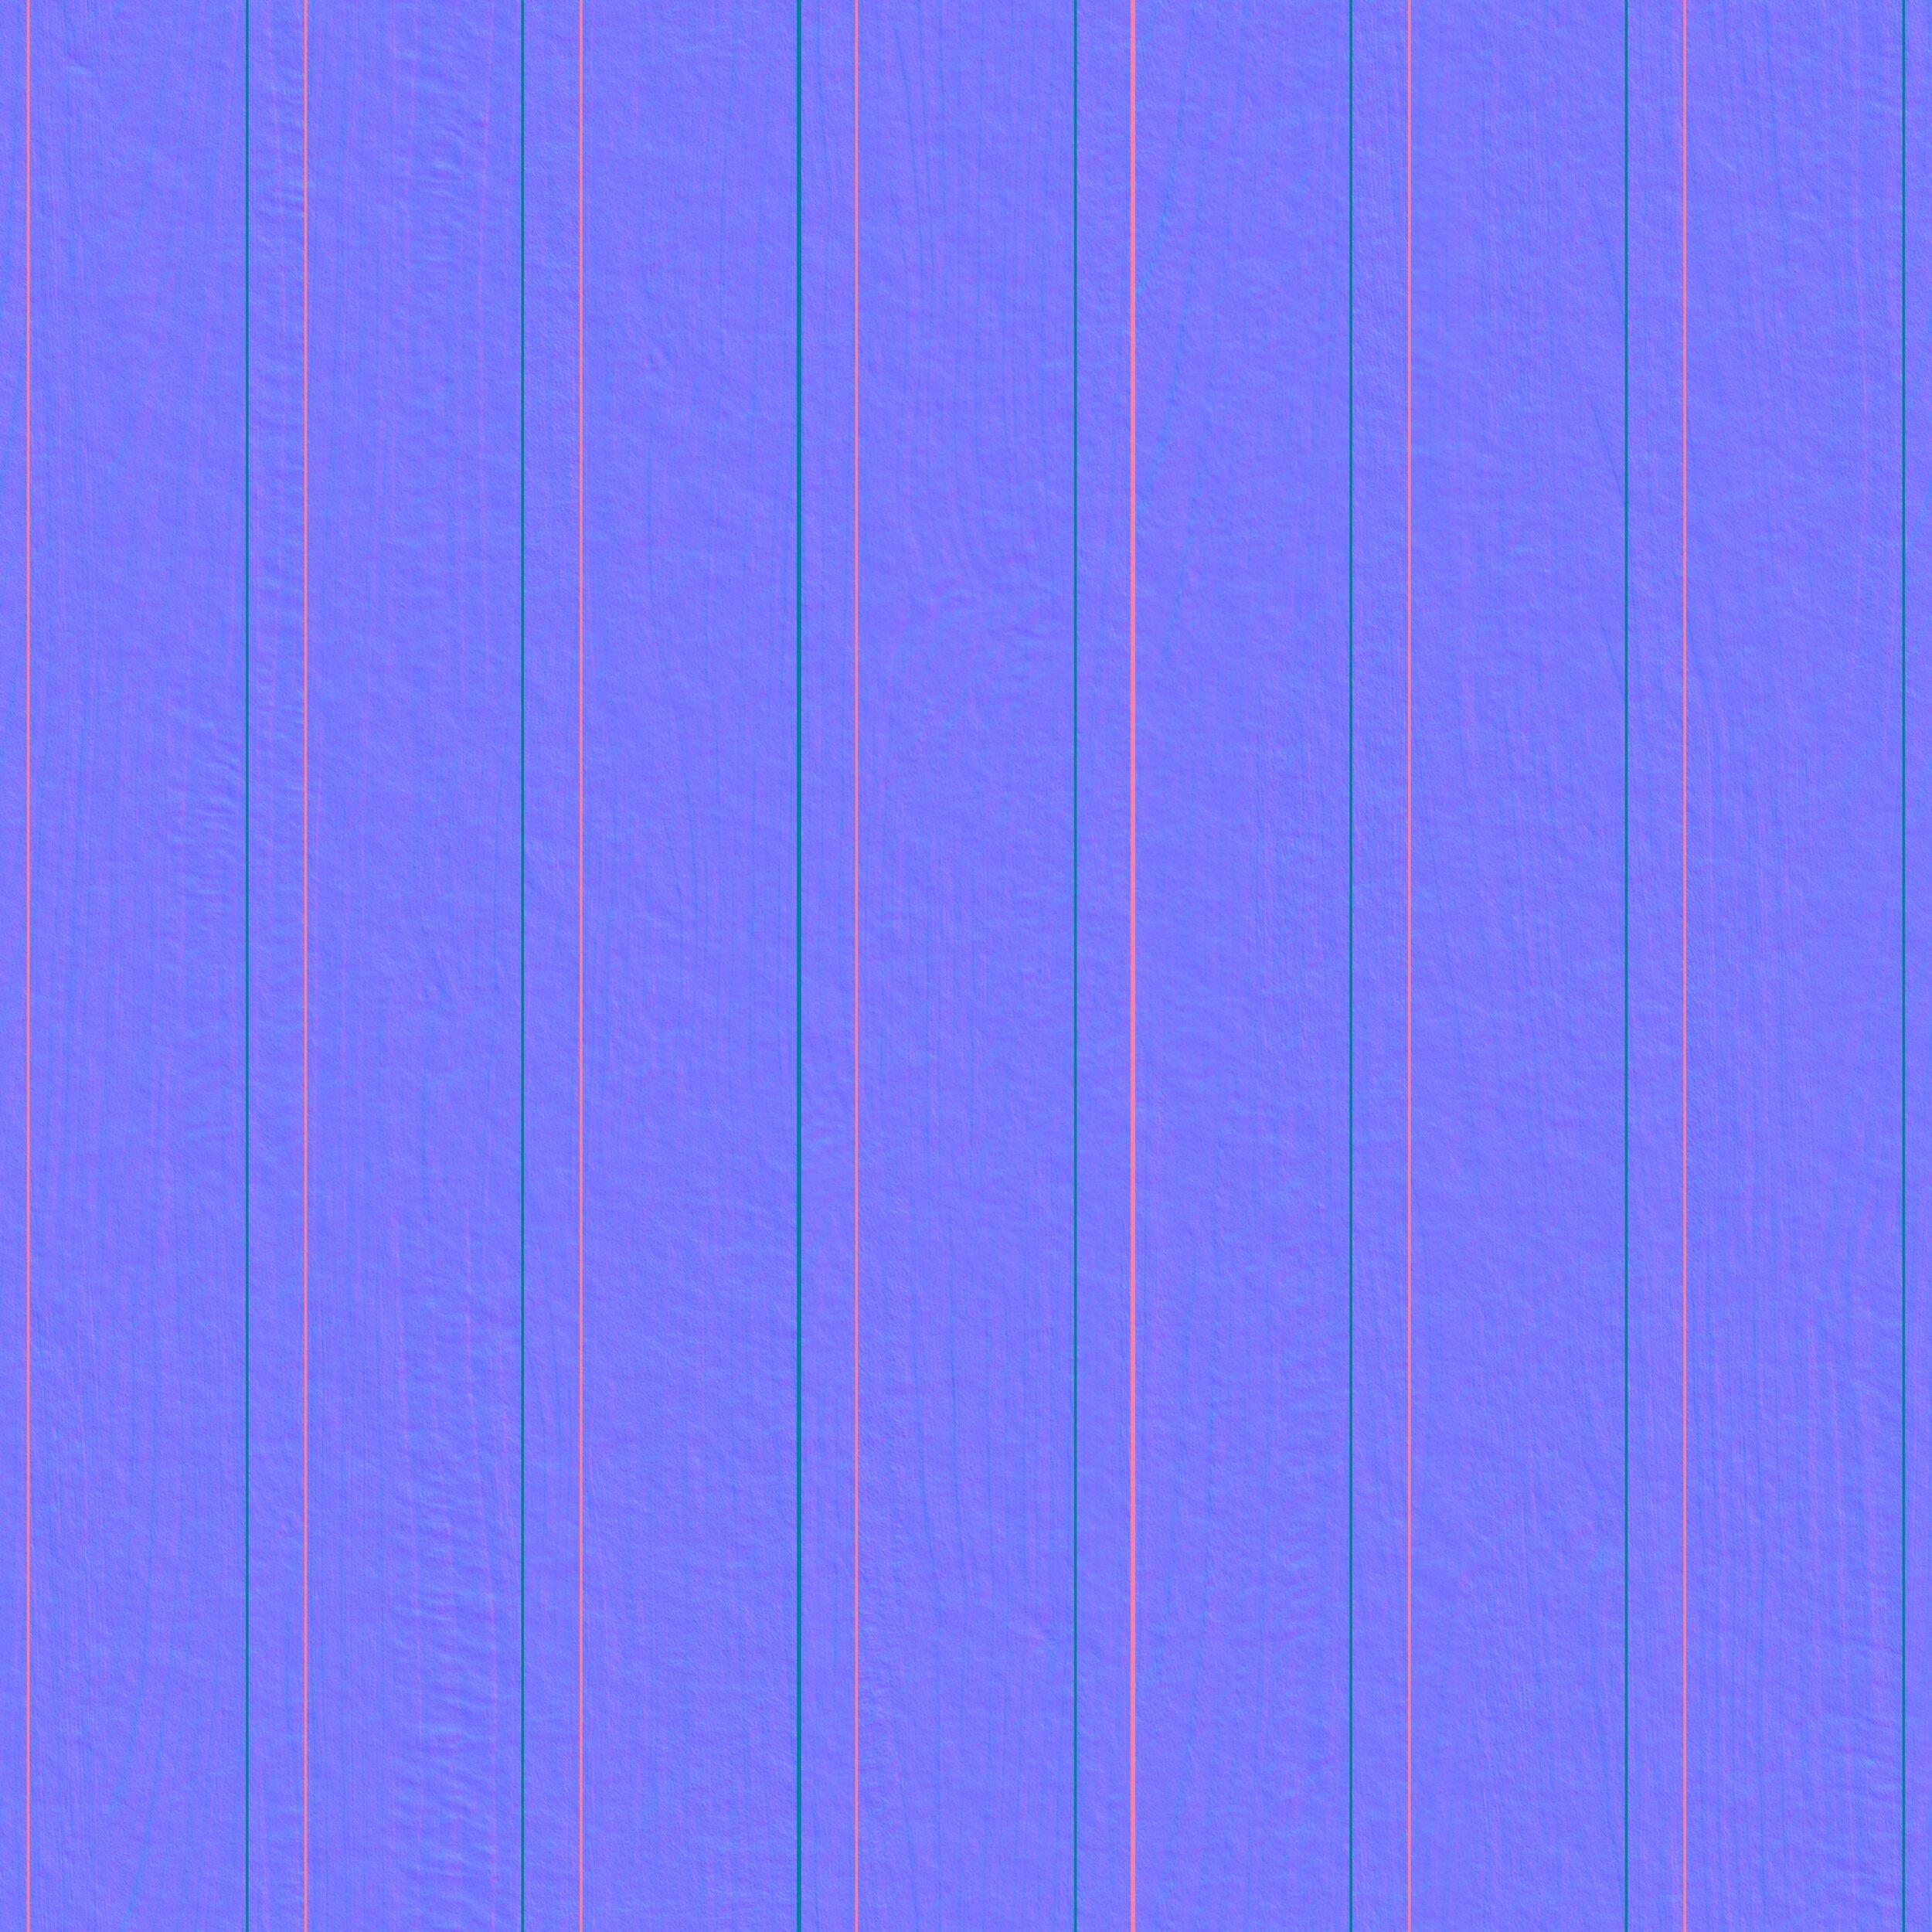 Siding_AI_01B_Green_NRM.jpg